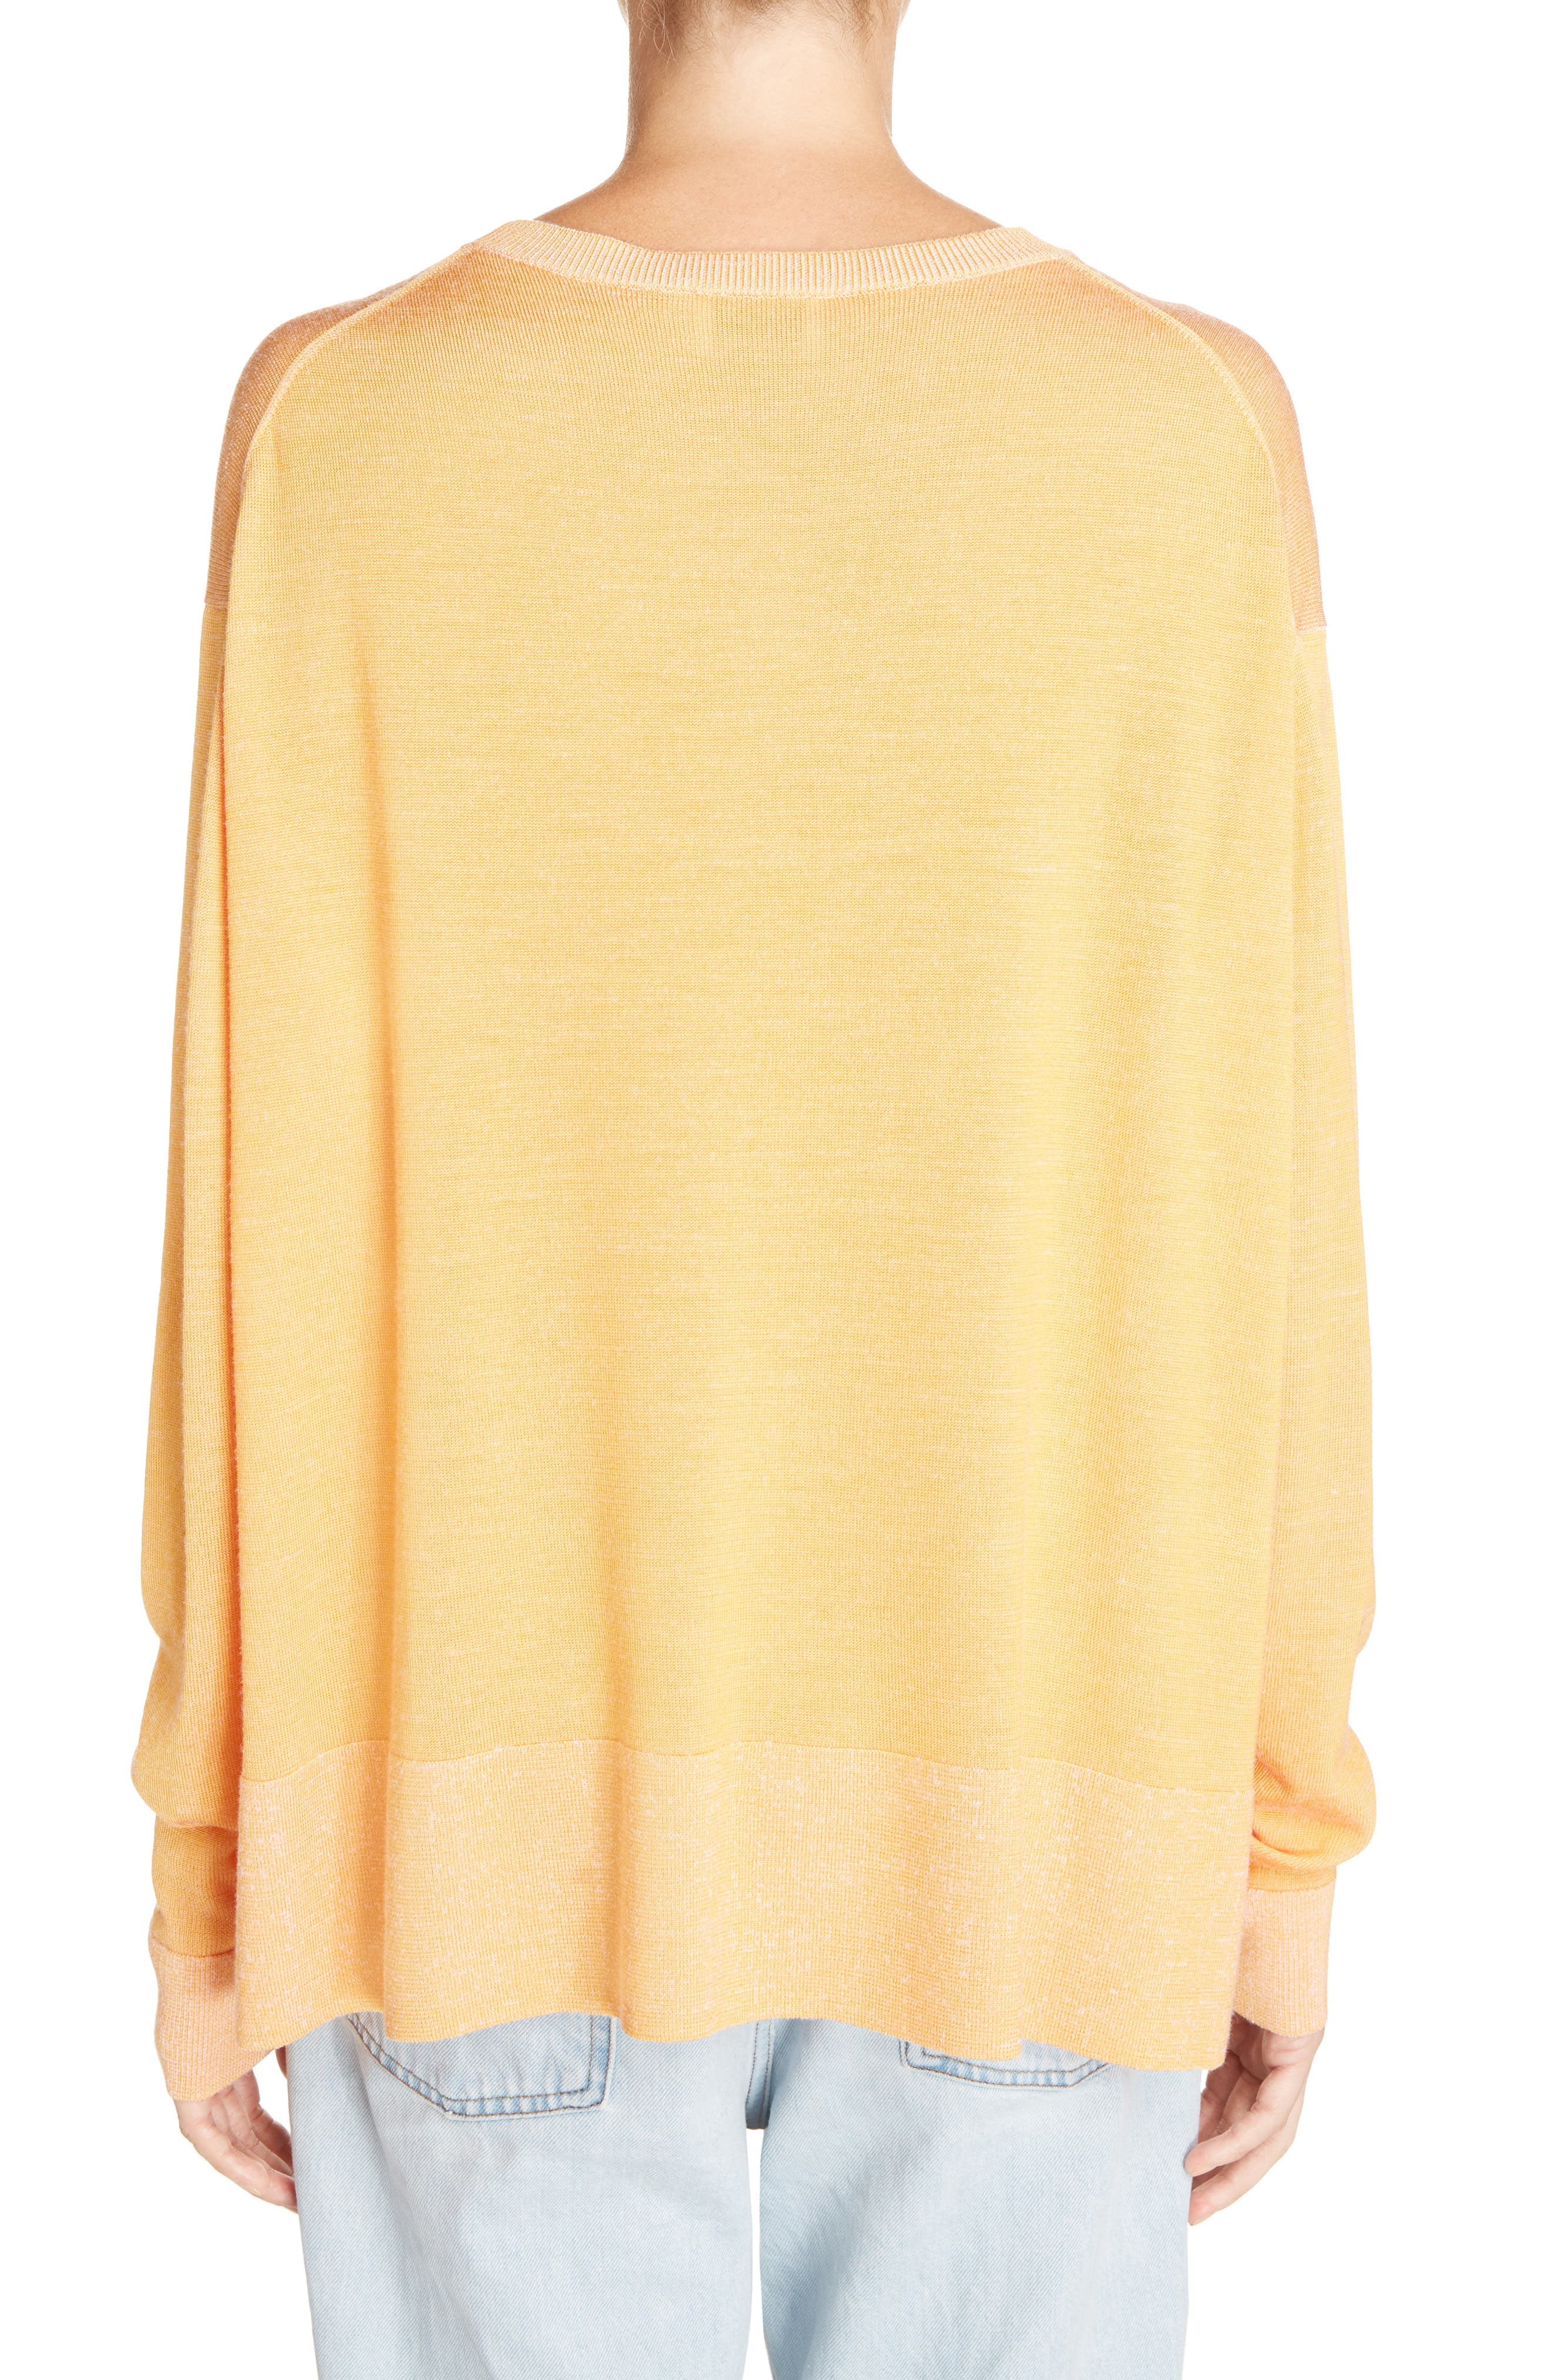 Finola 2-Tone Sweater,                             Alternate thumbnail 2, color,                             Orange